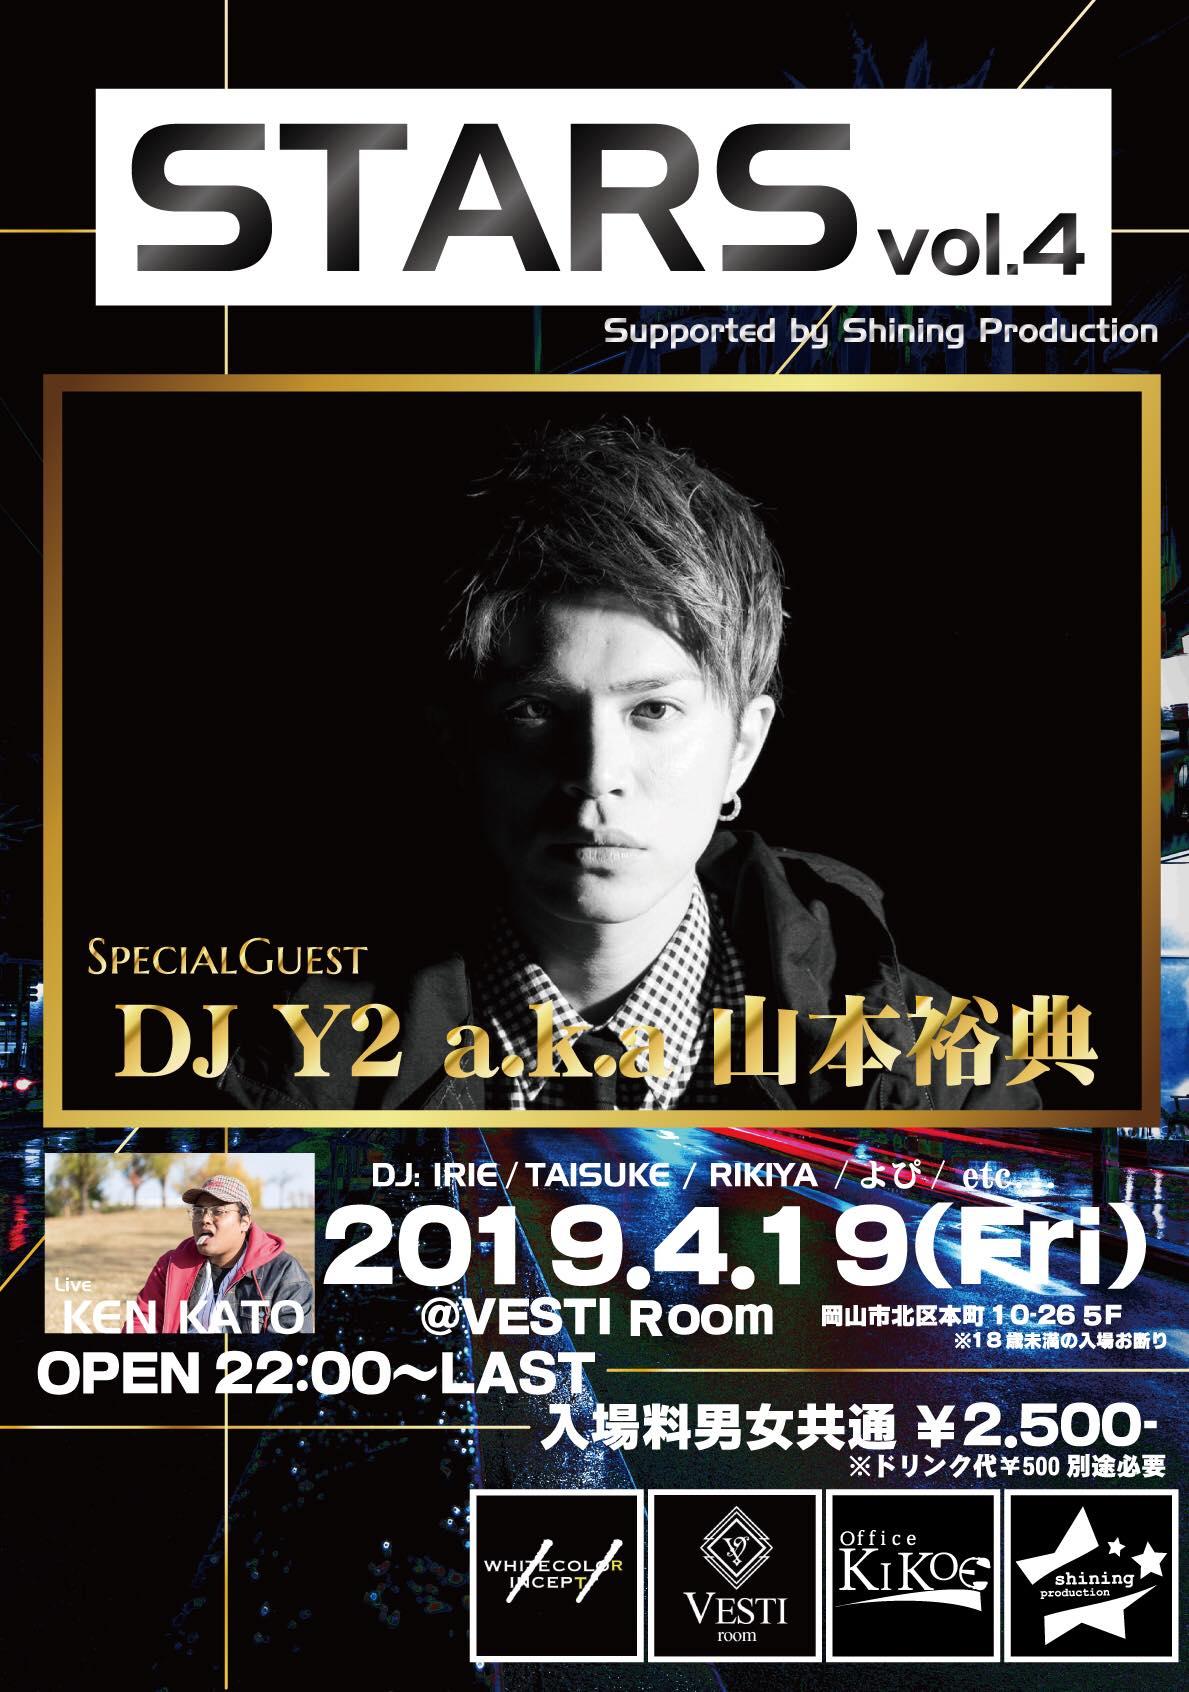 STARS~SPECIAL GUEST DJ Y2 aka 山本裕典~